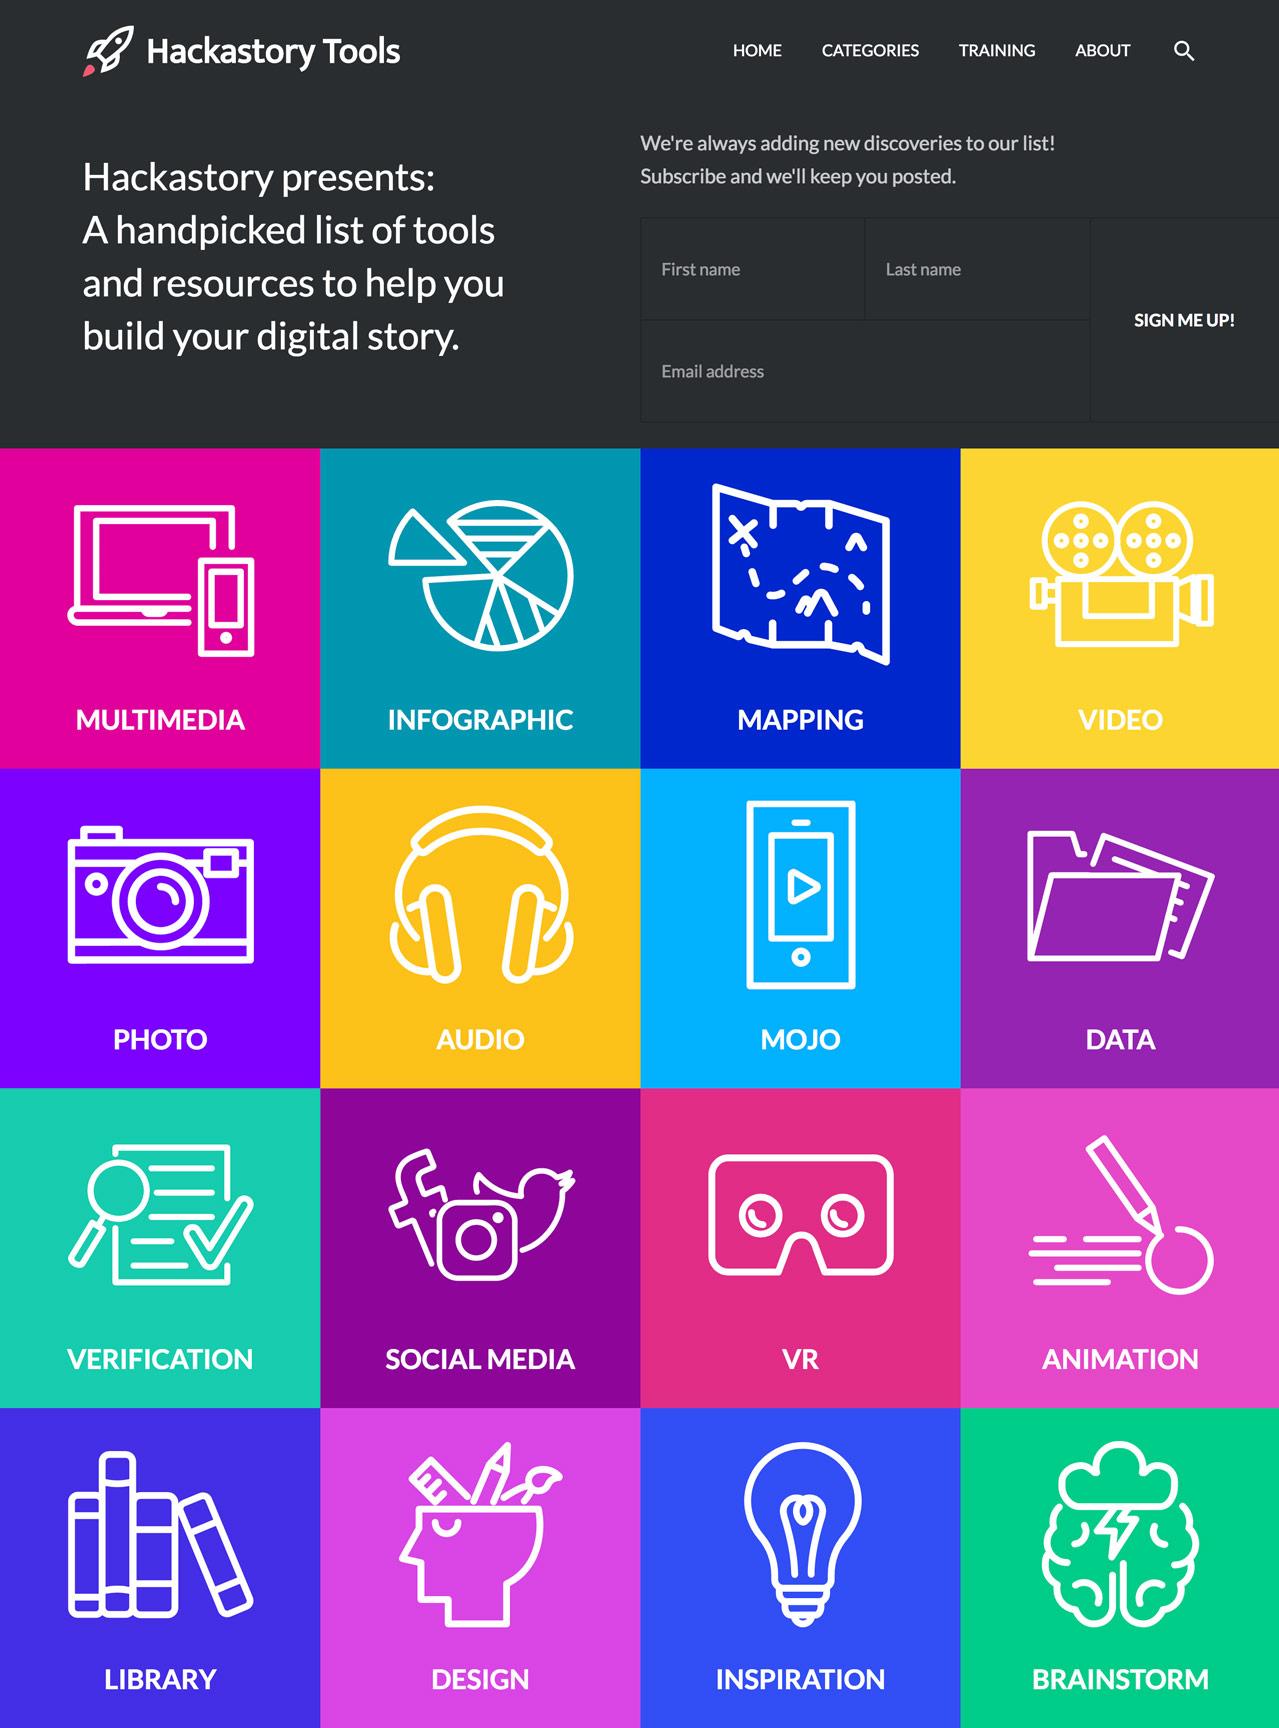 Hackastory - DigitalStory.Tools